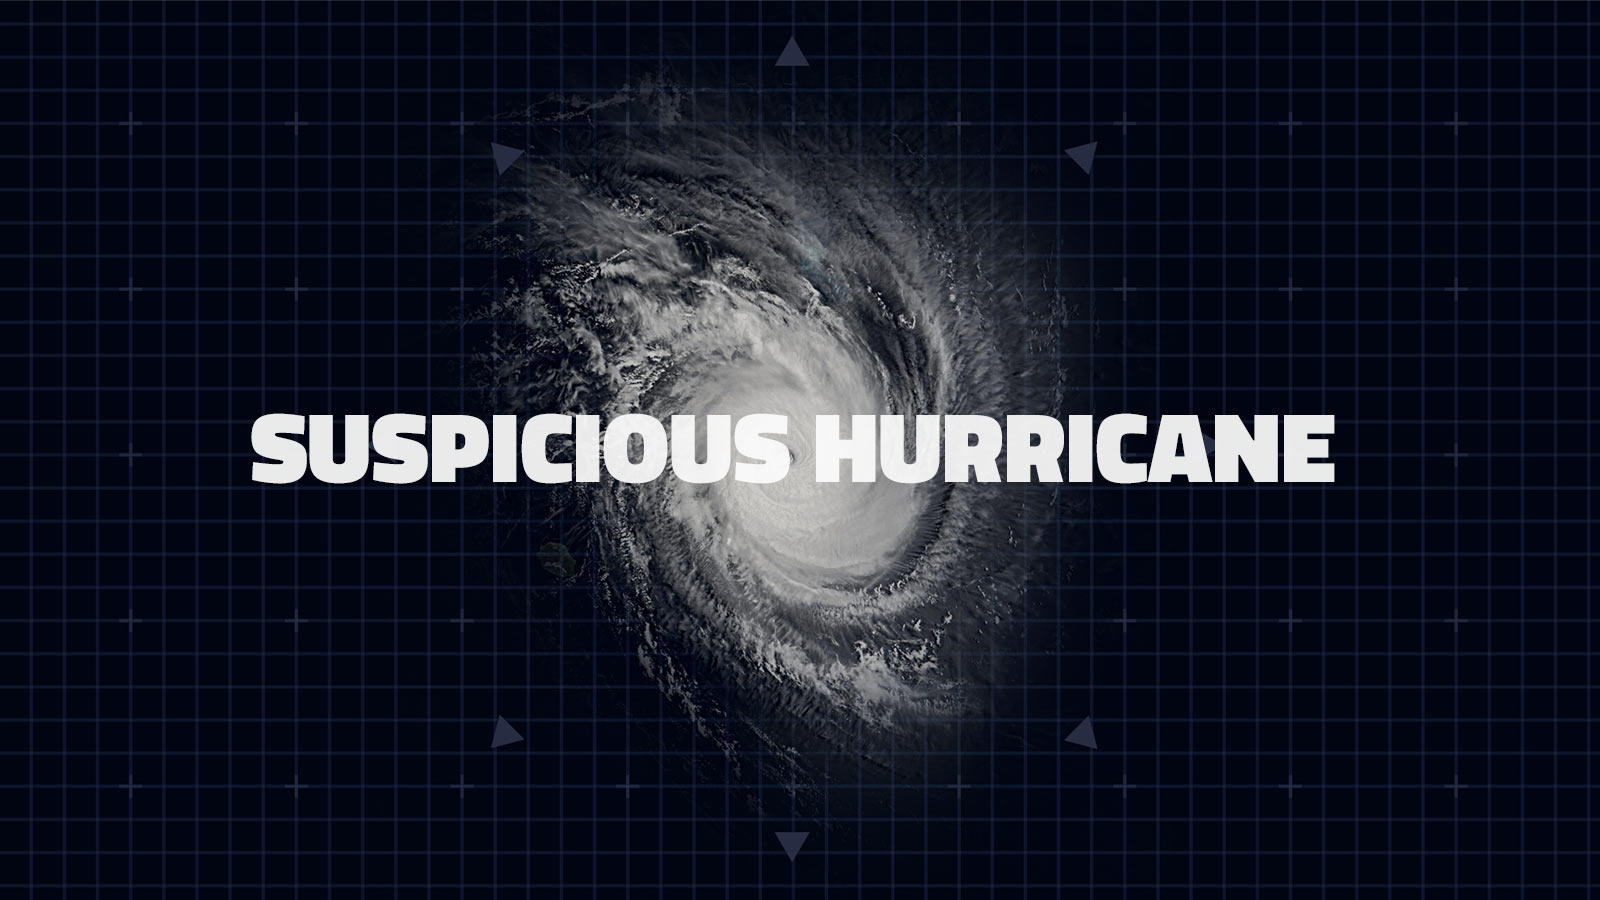 The Case of the Suspicious Hurricane